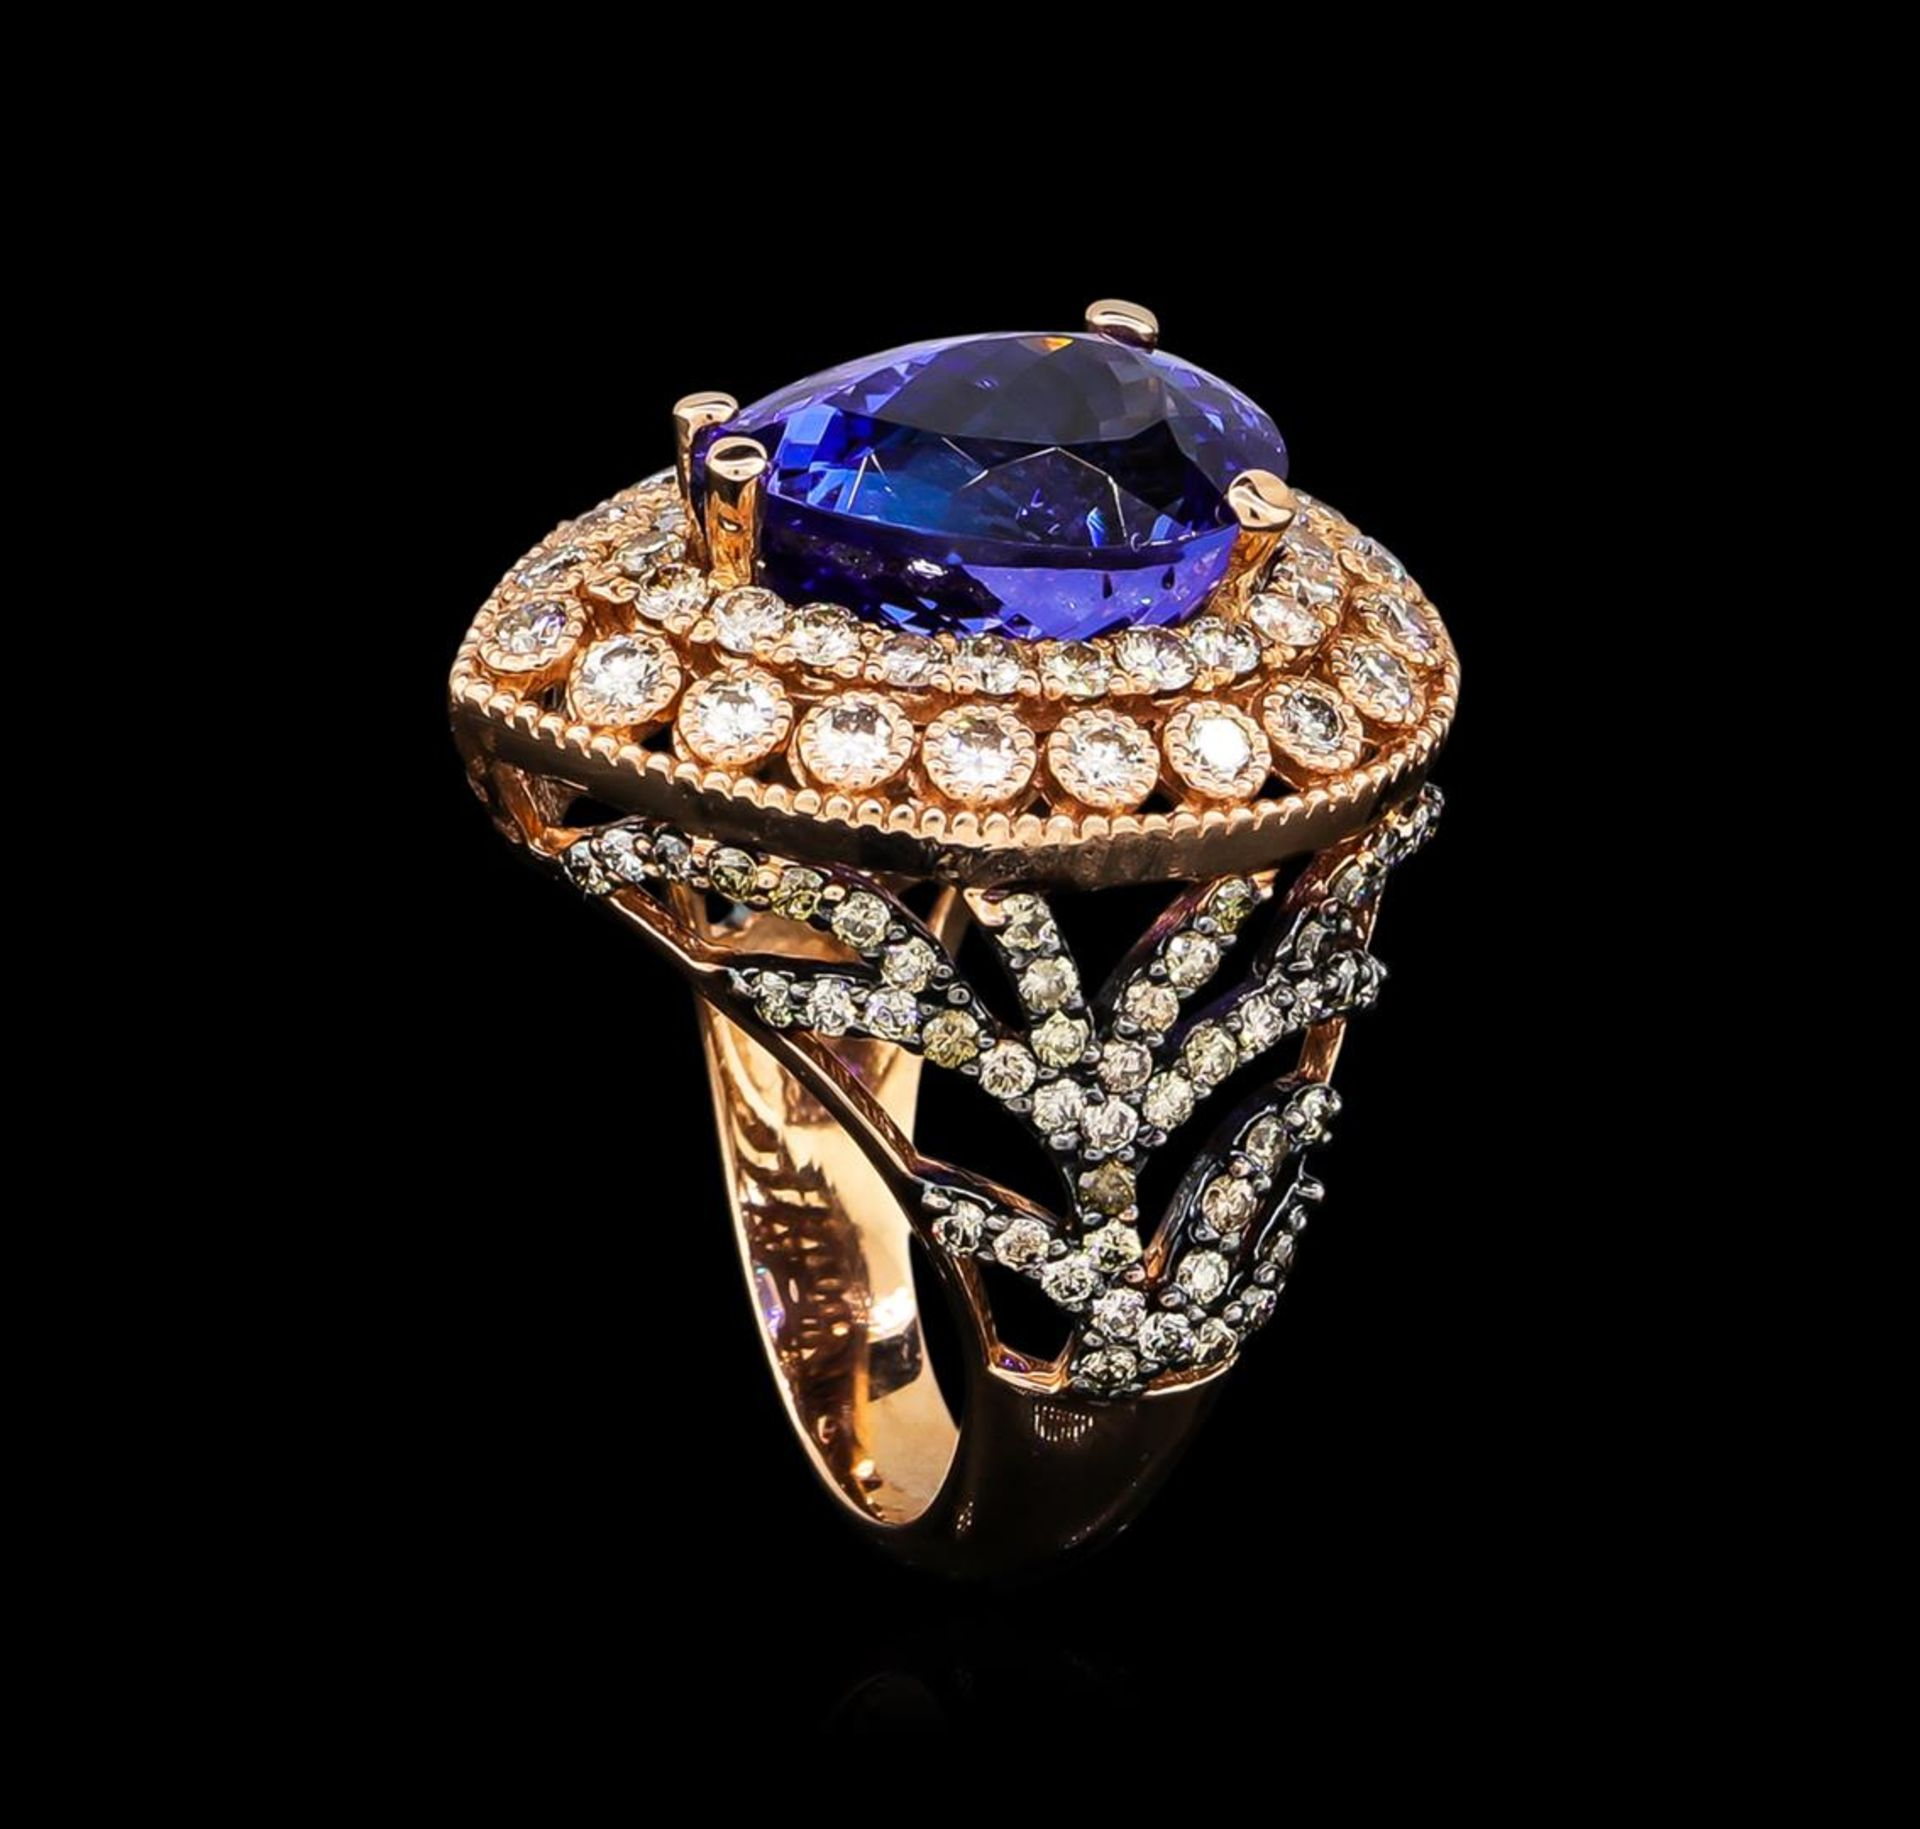 7.31 ctw Tanzanite and Diamond Ring - 14KT Rose Gold - Image 4 of 5